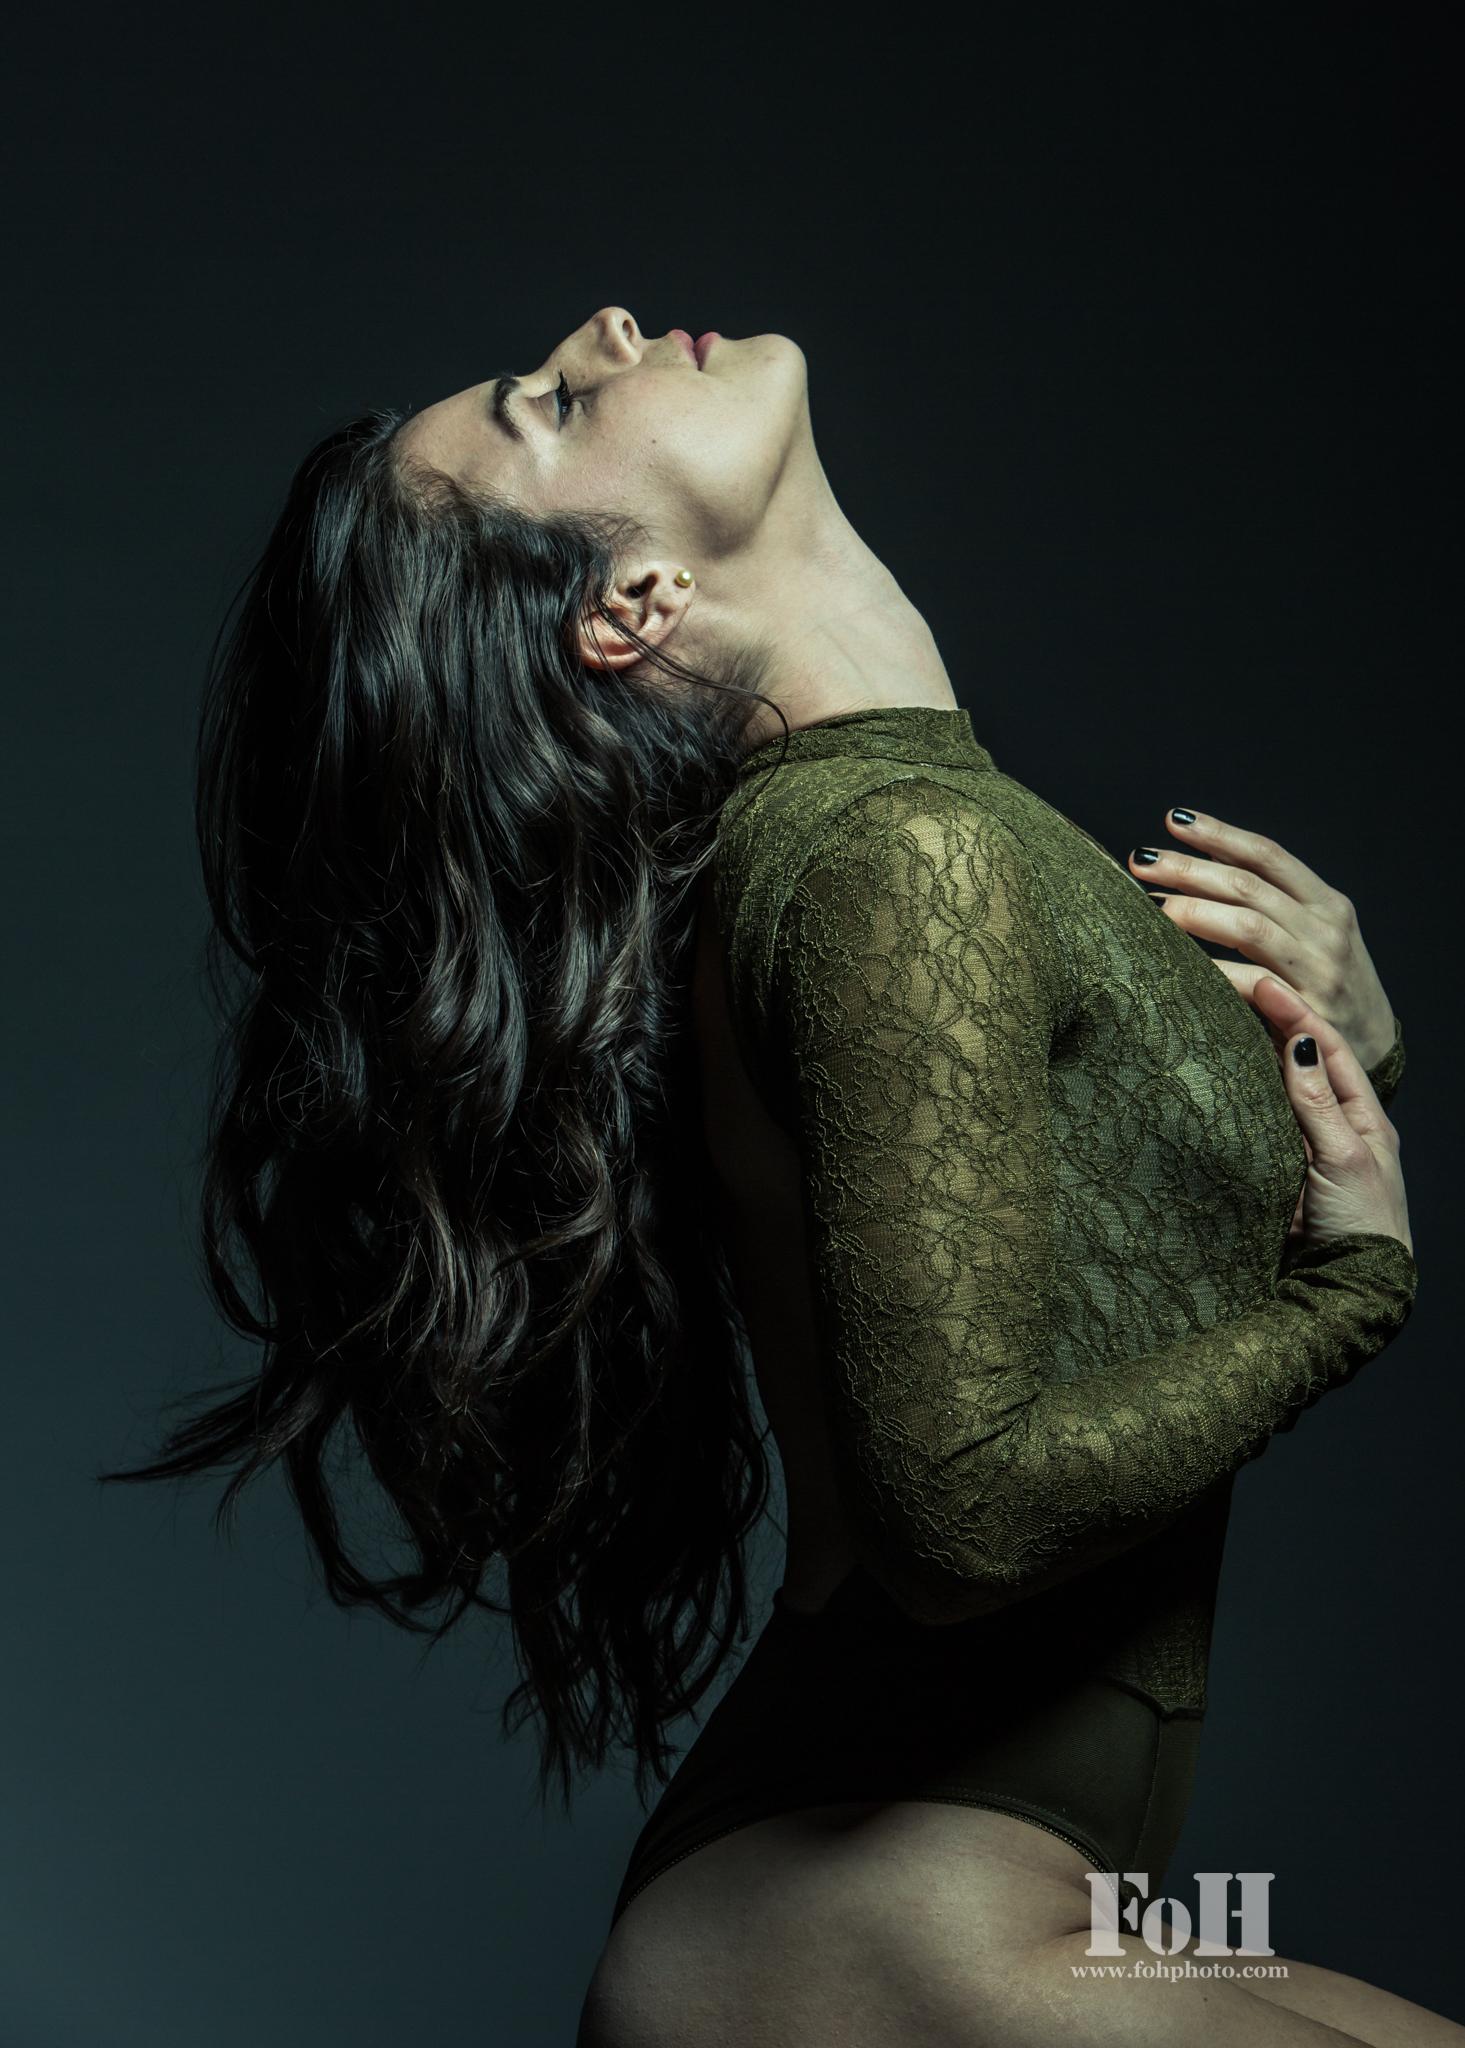 Sara Garcia - Photo by Bobby Singh/@fohphoto